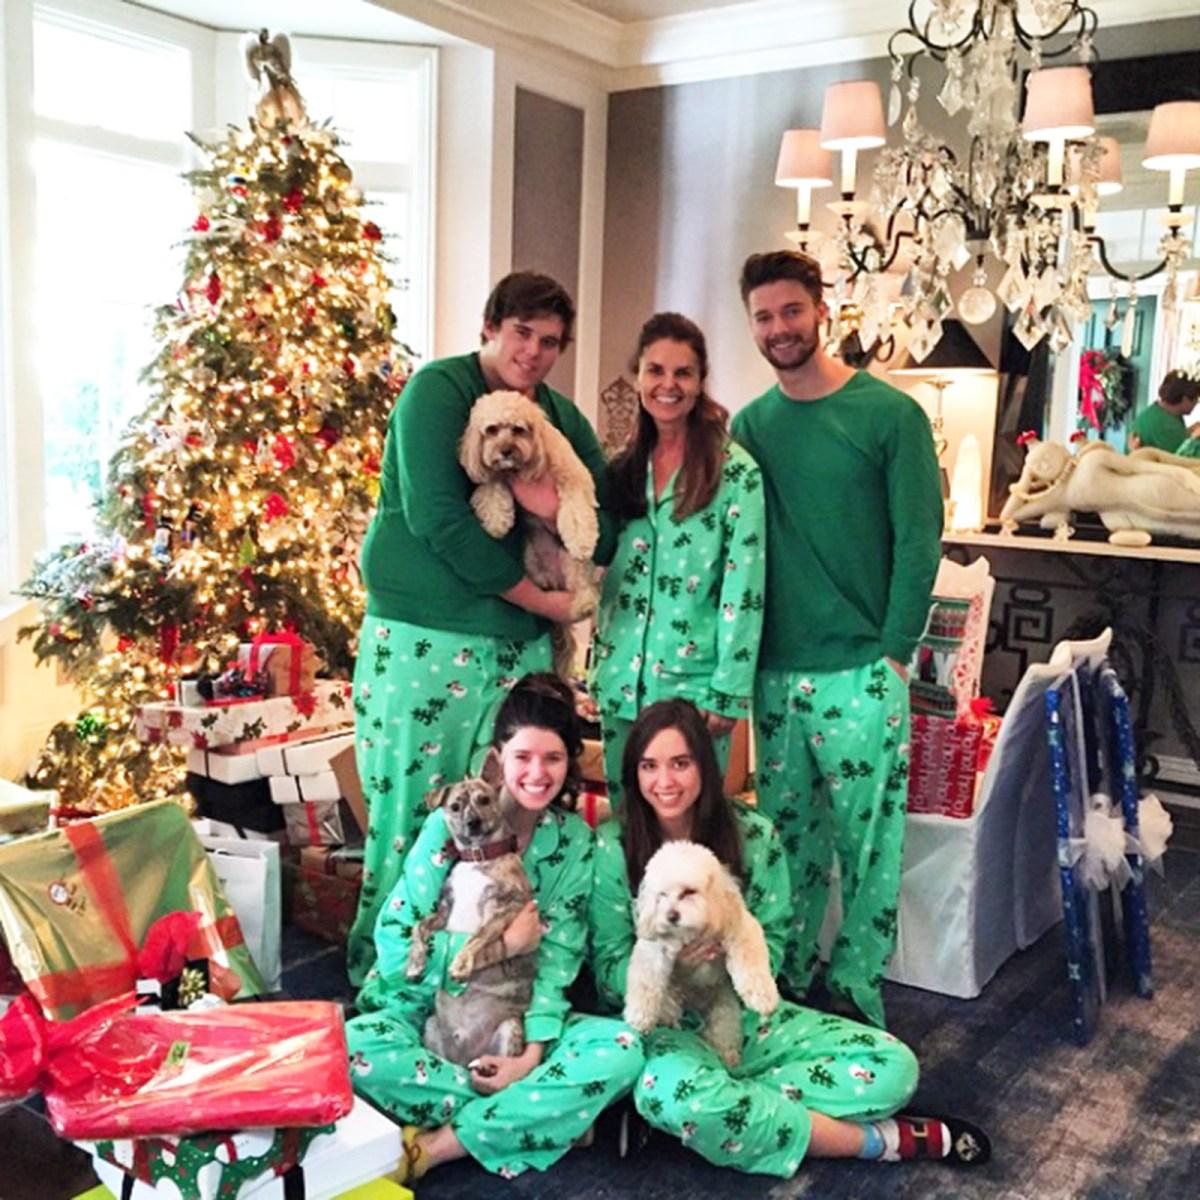 Celebrities Wearing Matching Holiday Christmas Pajamas Pics